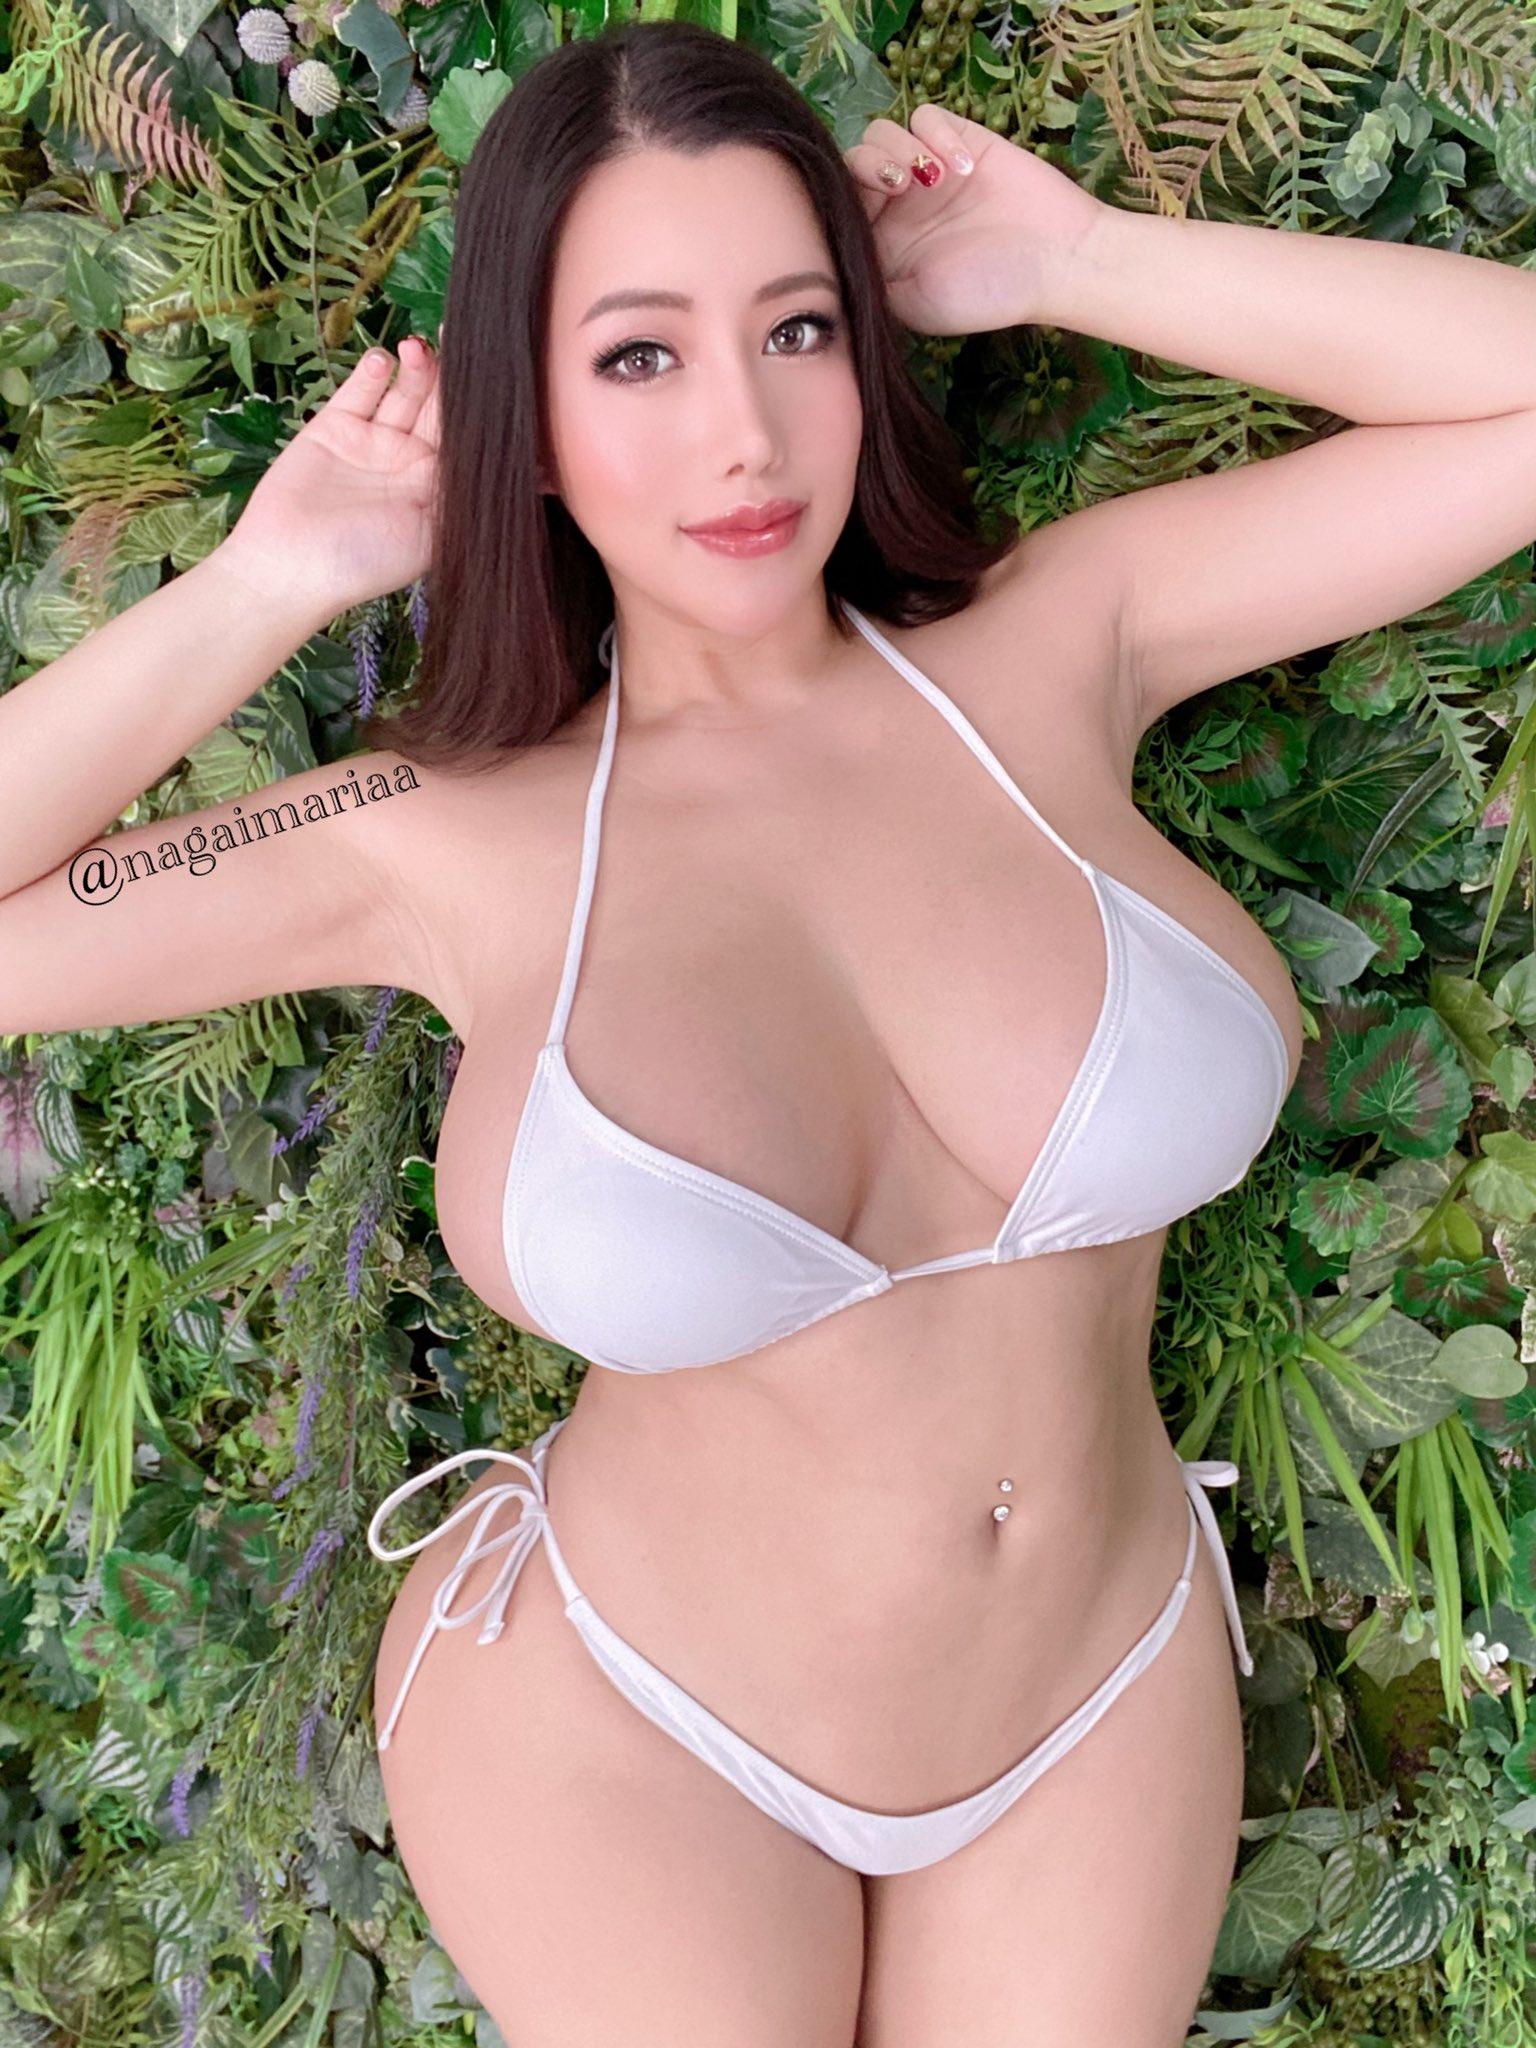 Nagai Maria Nude Leaked (3 Videos + 136 Photos) 335